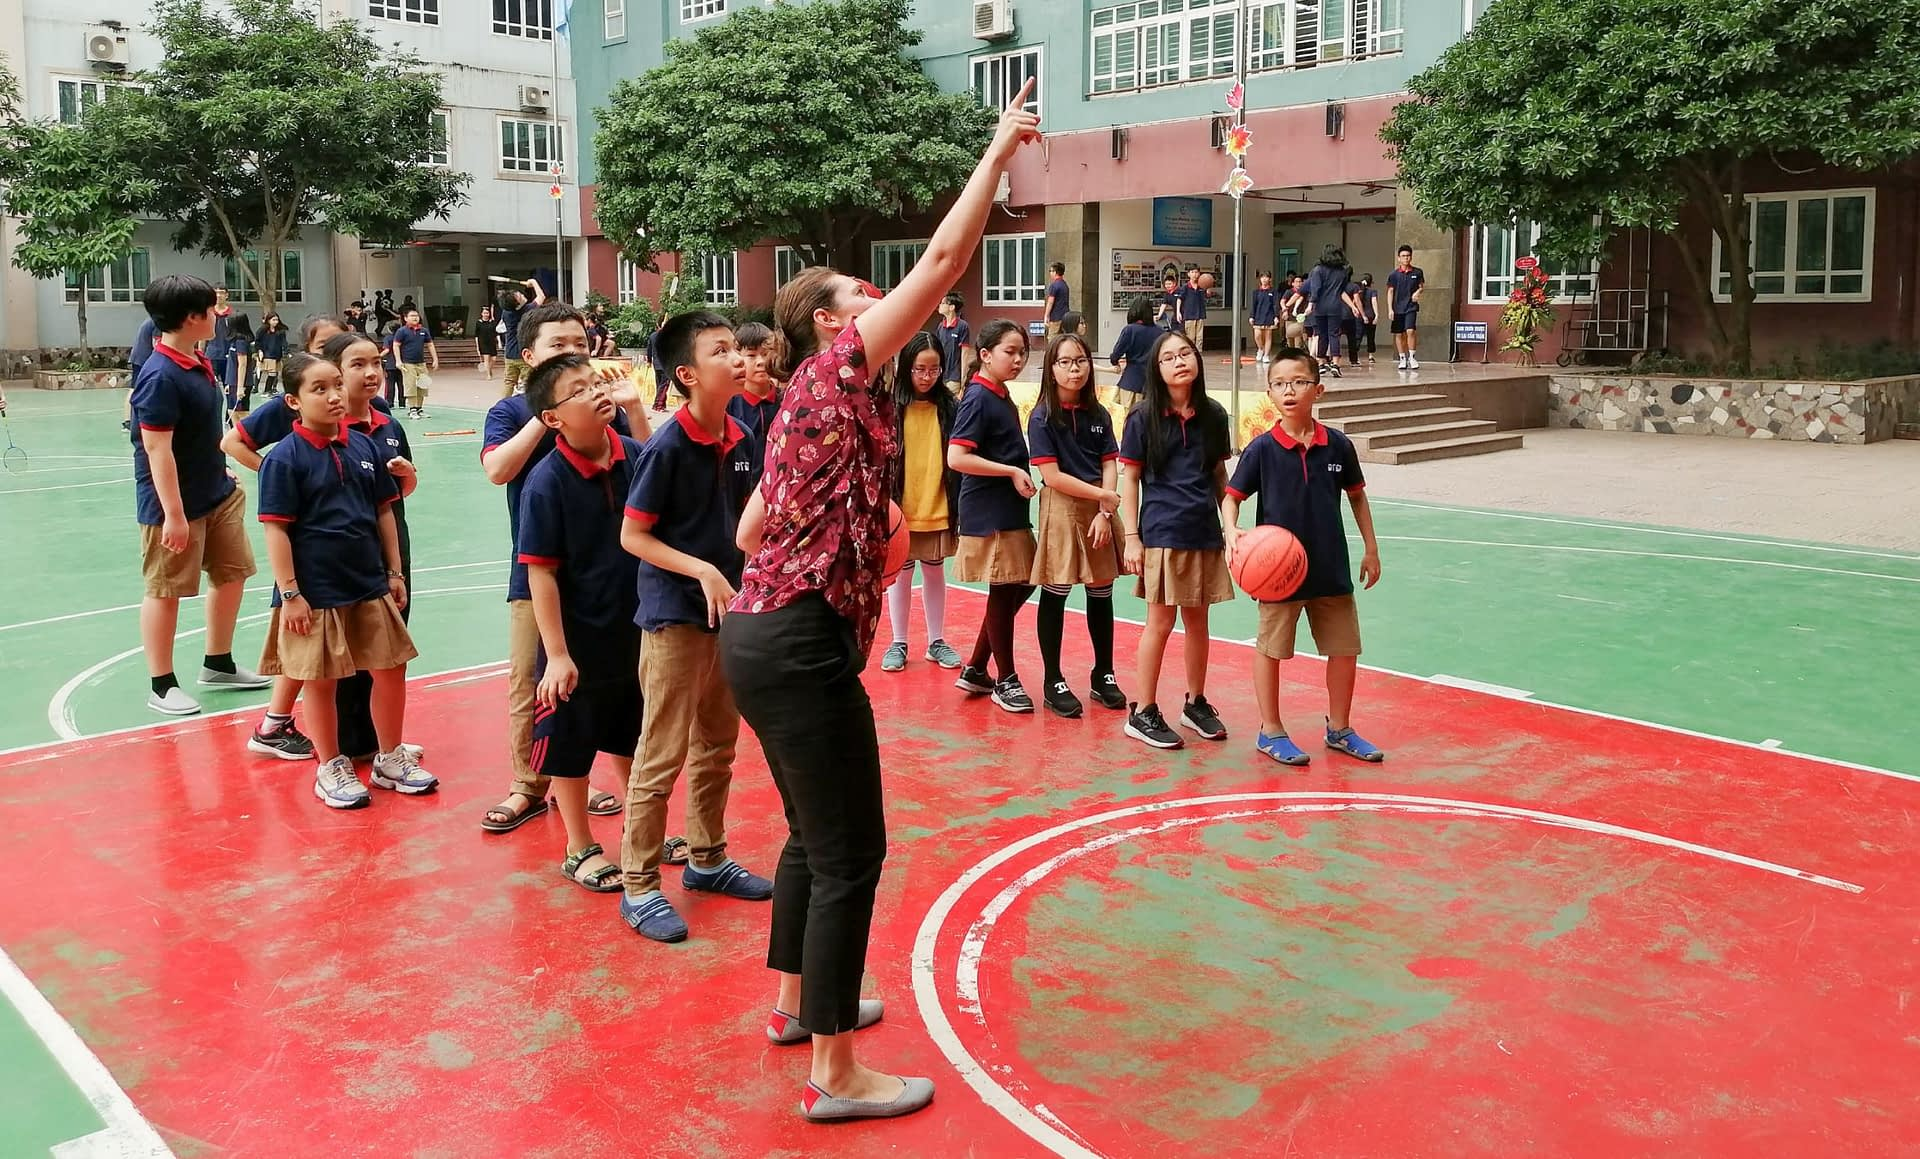 A teacher shows a class how to play basketball